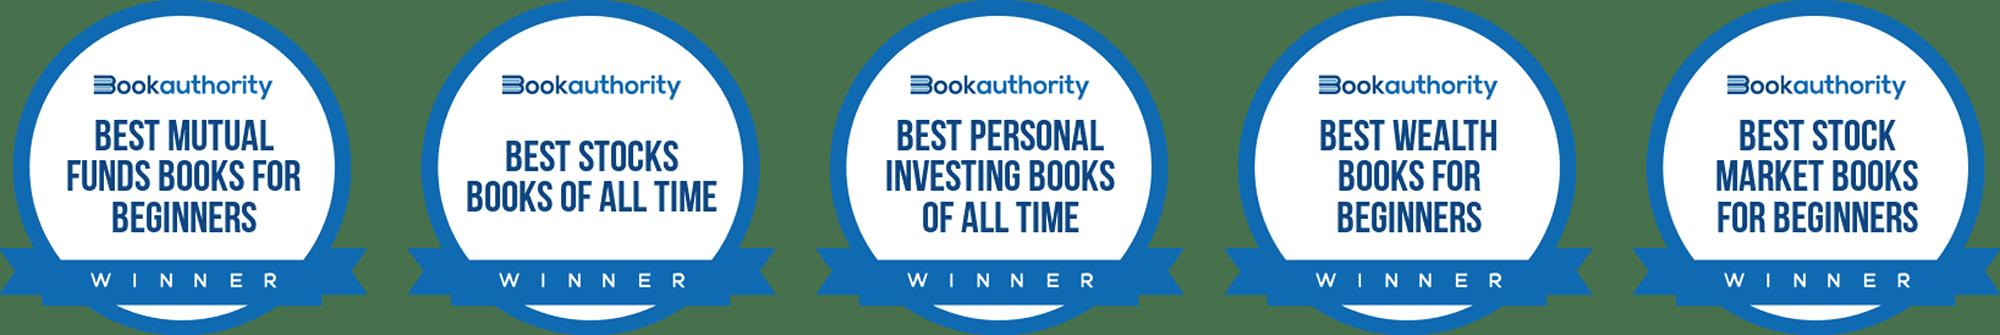 Ted_InvestingQSG_AwardBadges